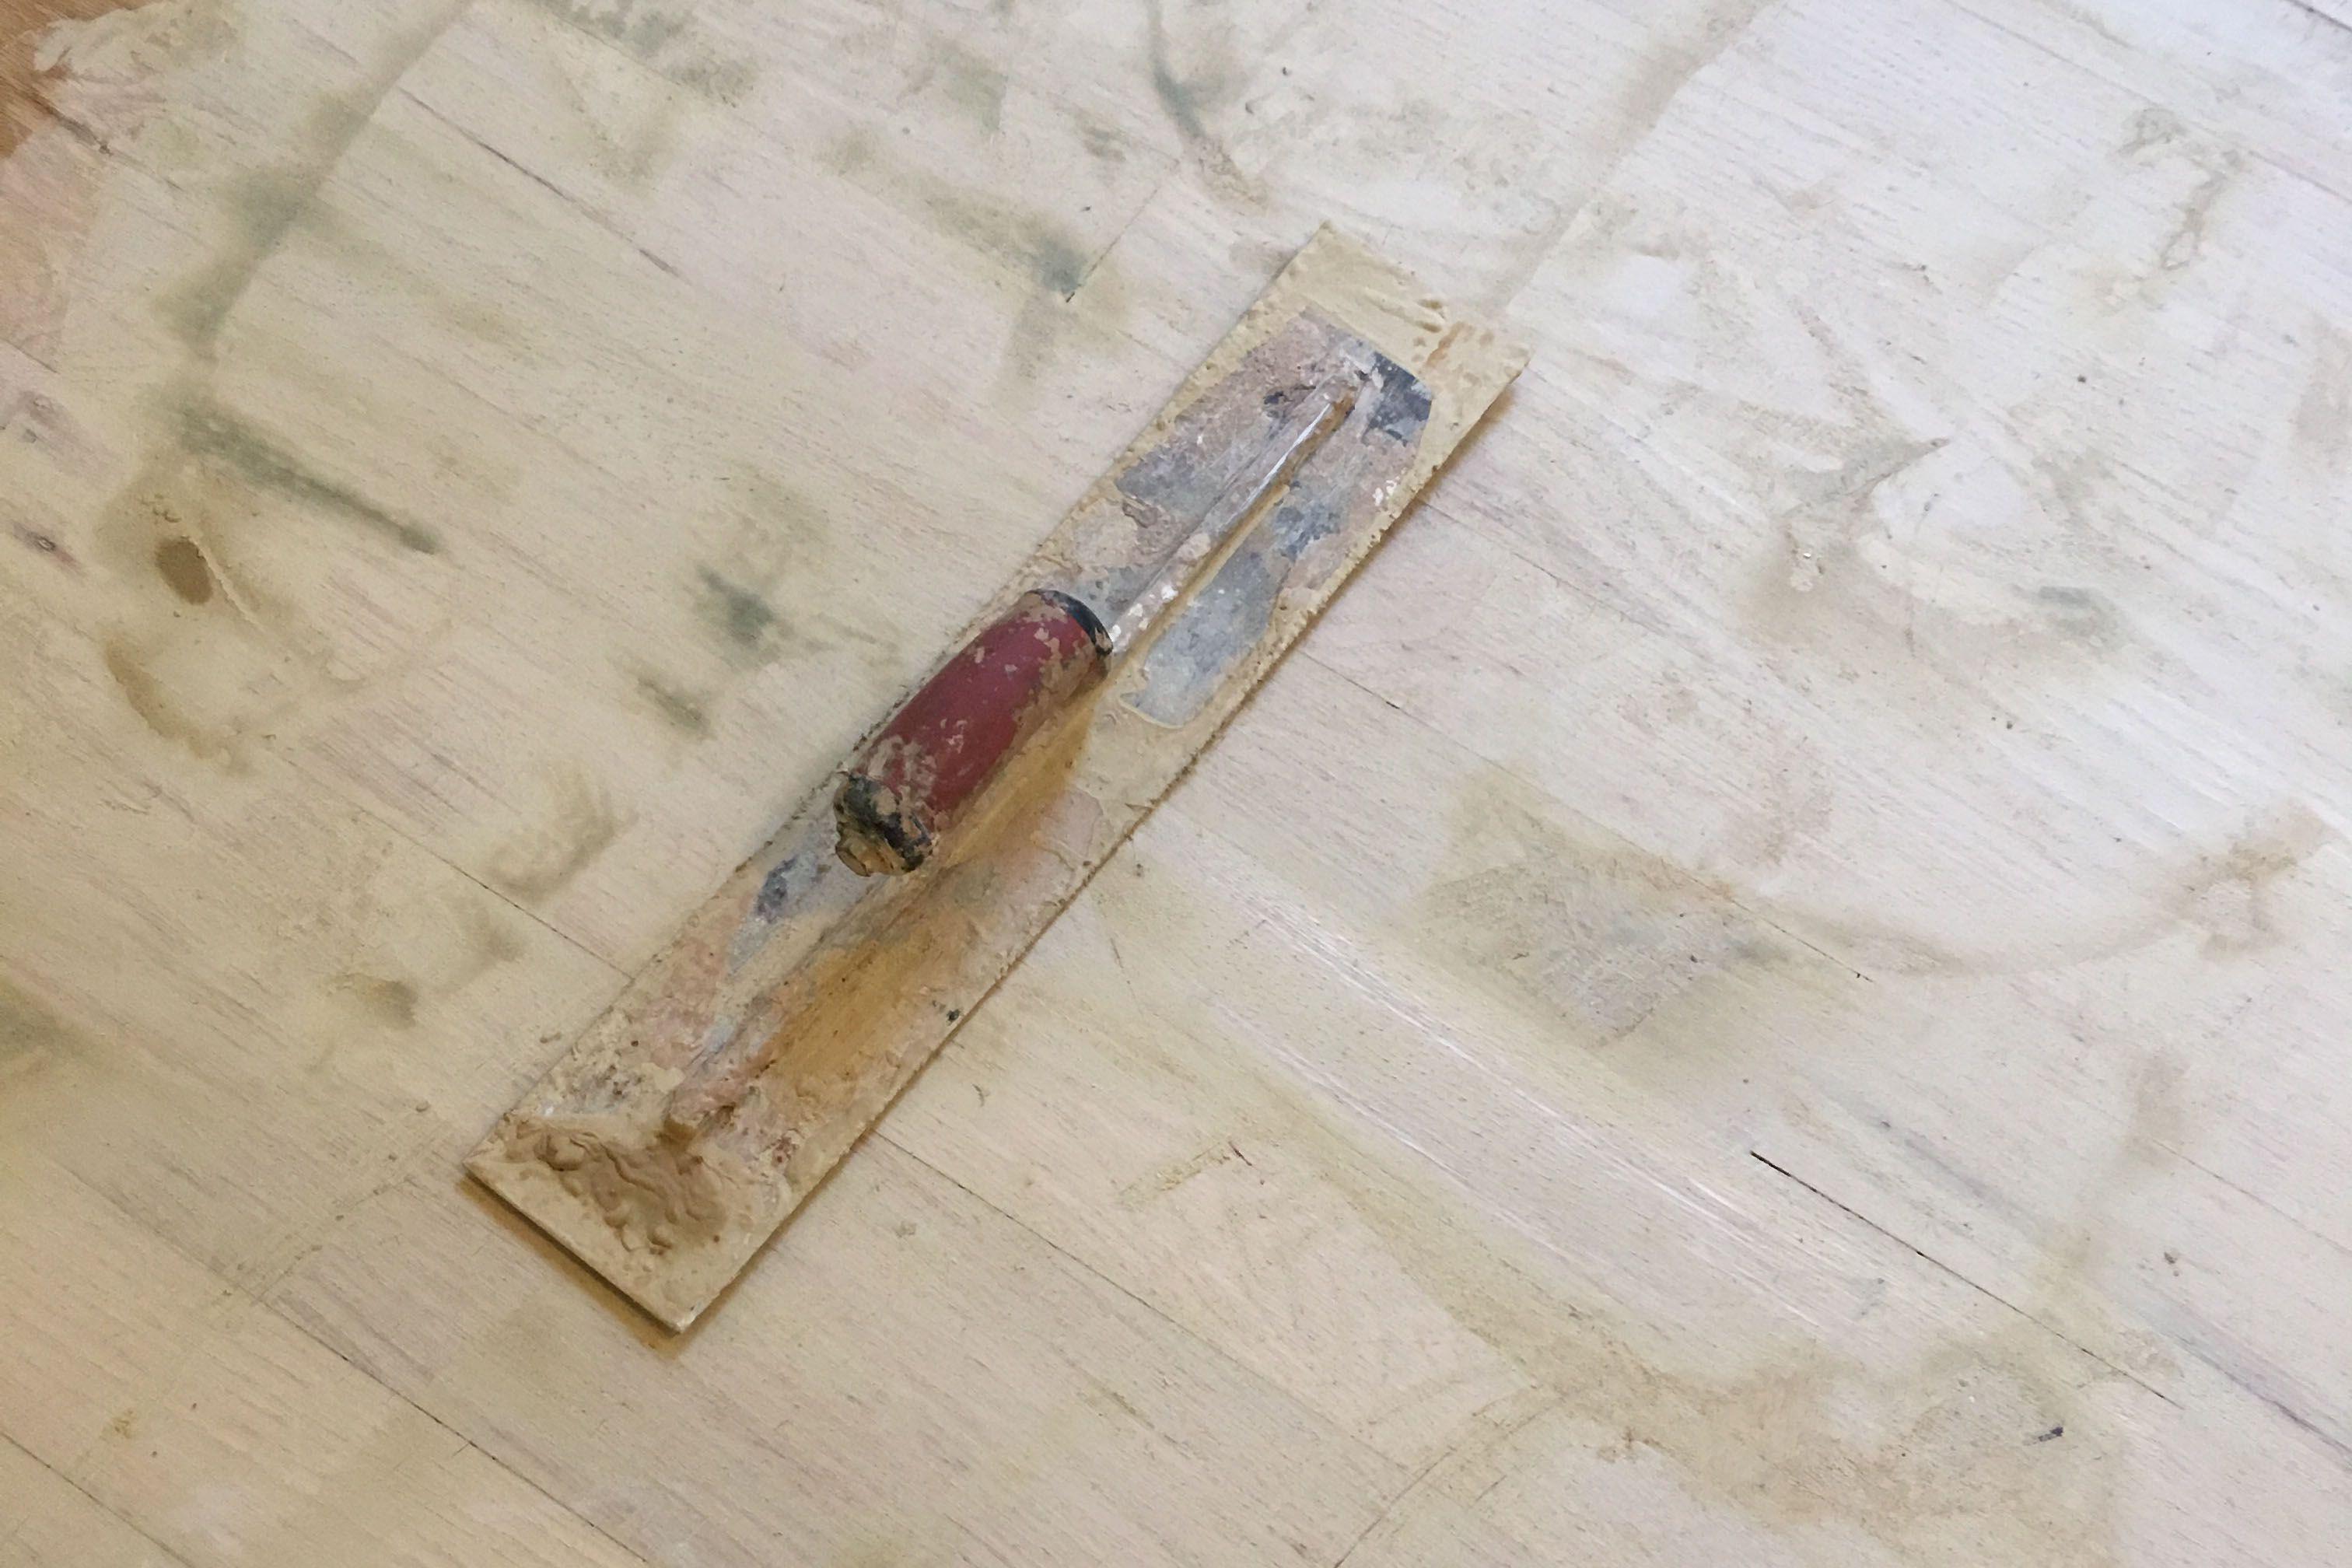 21 Awesome Hardwood Floor Restore Kit 2021 free download hardwood floor restore kit of 7 things to know before you refinish hardwood floors for trough hardwood floor manhattan avenue via smallspaces about com 579138783df78c173490f8a5